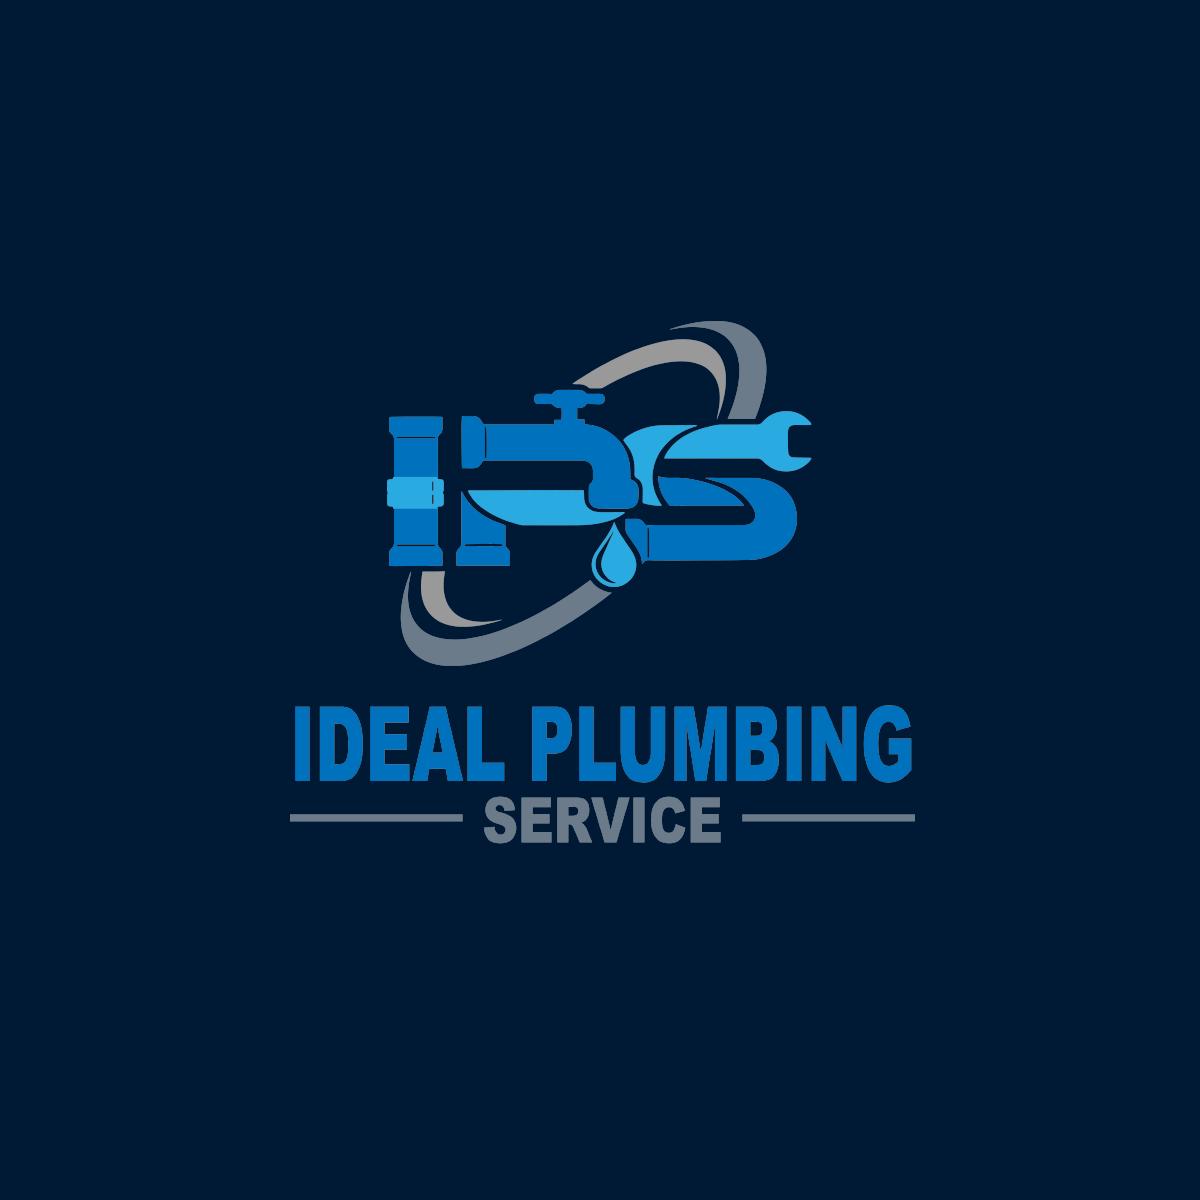 Ideal Plumbing Service